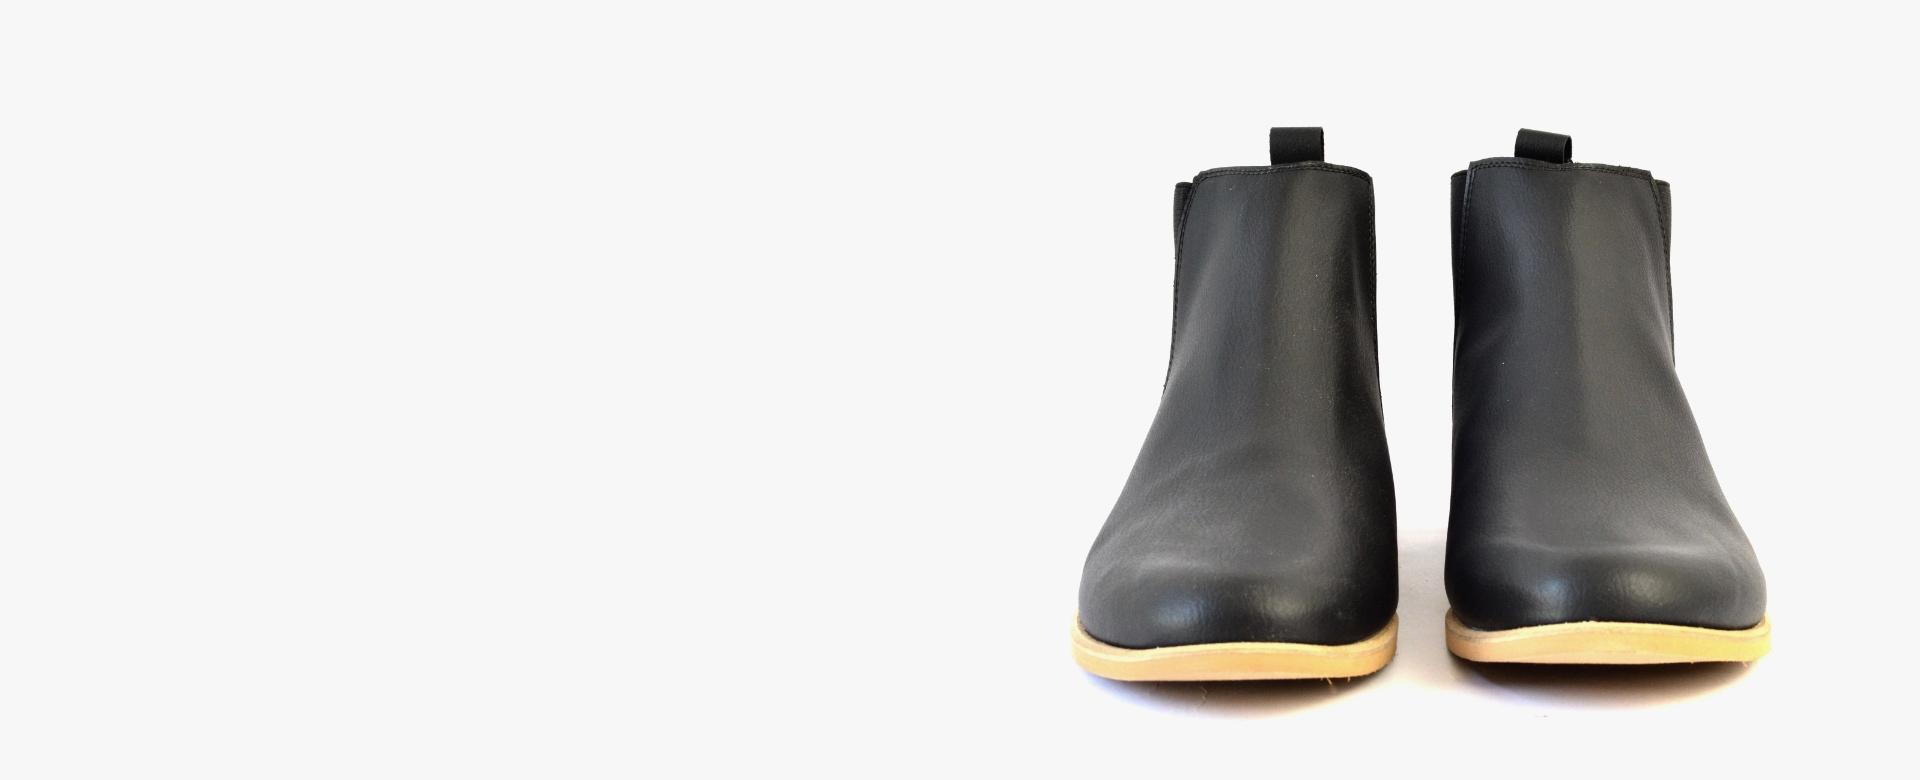 sorbas vegane chelsea boots schuhe schwarz herren damen